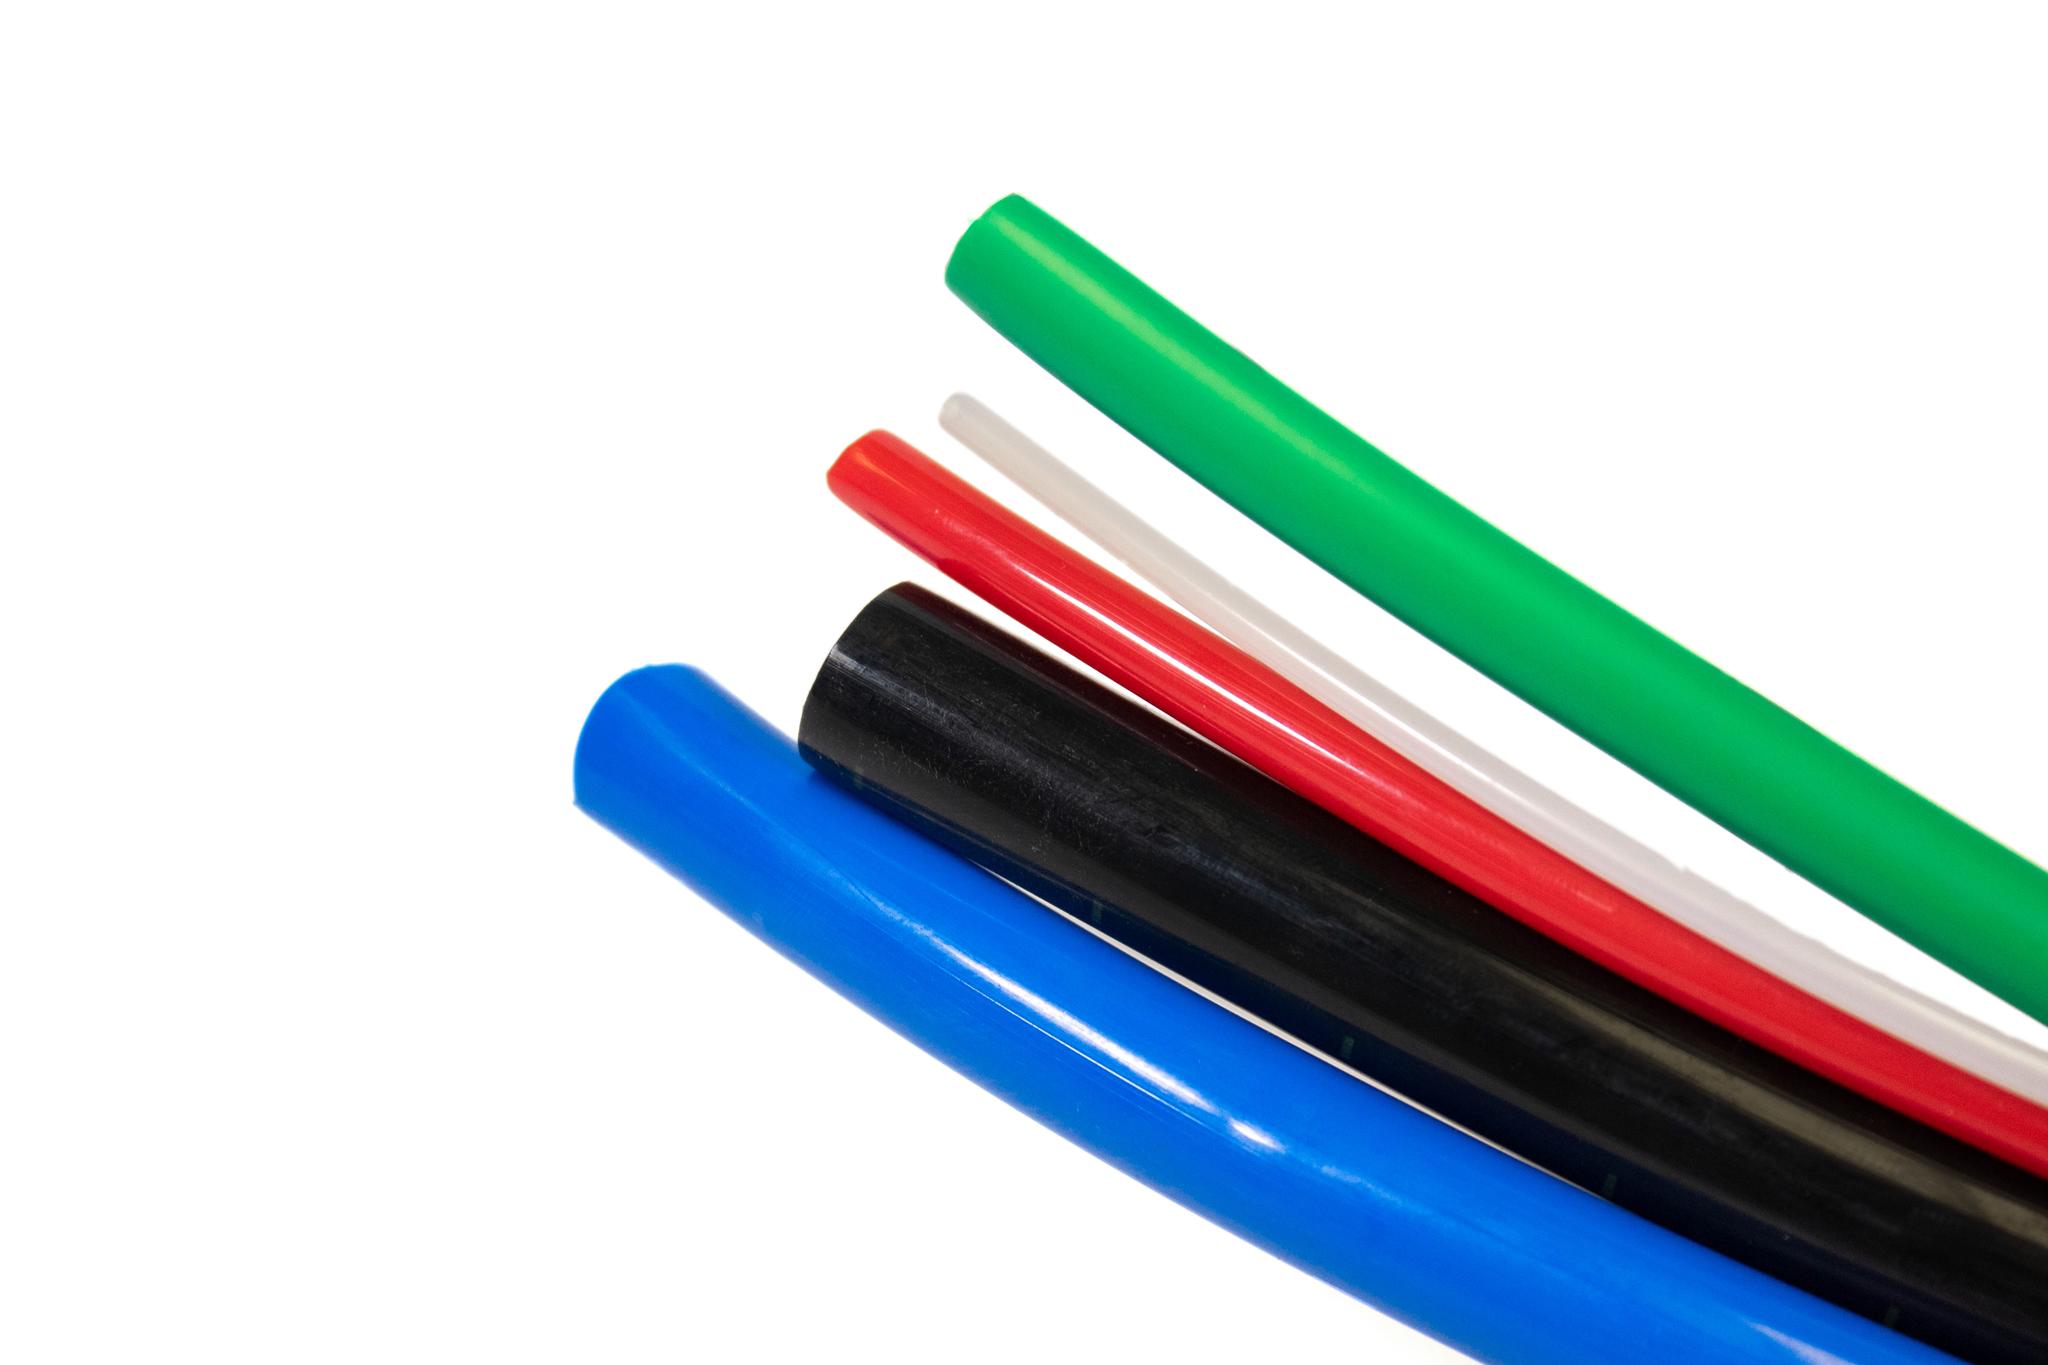 Flexible Nylon Hose Tubing Standard Wall 11.0mm O/D x 8.0mm I/D x 1.5mm Wall Natural